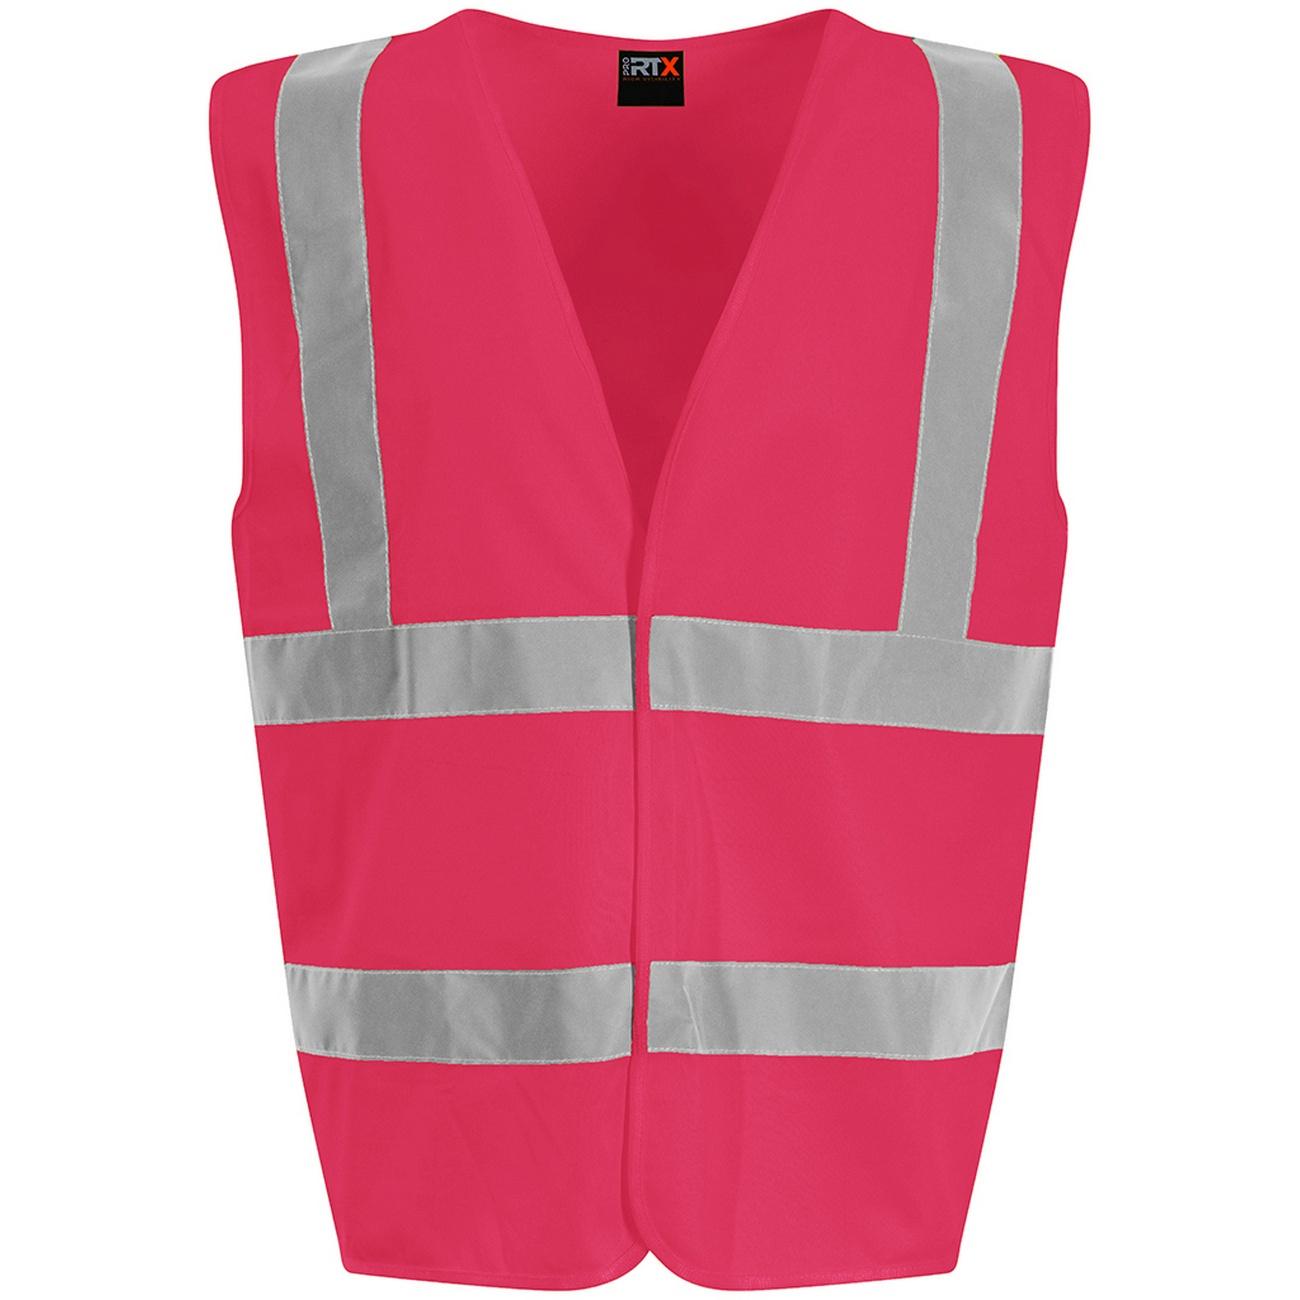 PRO RTX High Visibility Unisex Waistcoat (4XL) (Pink)